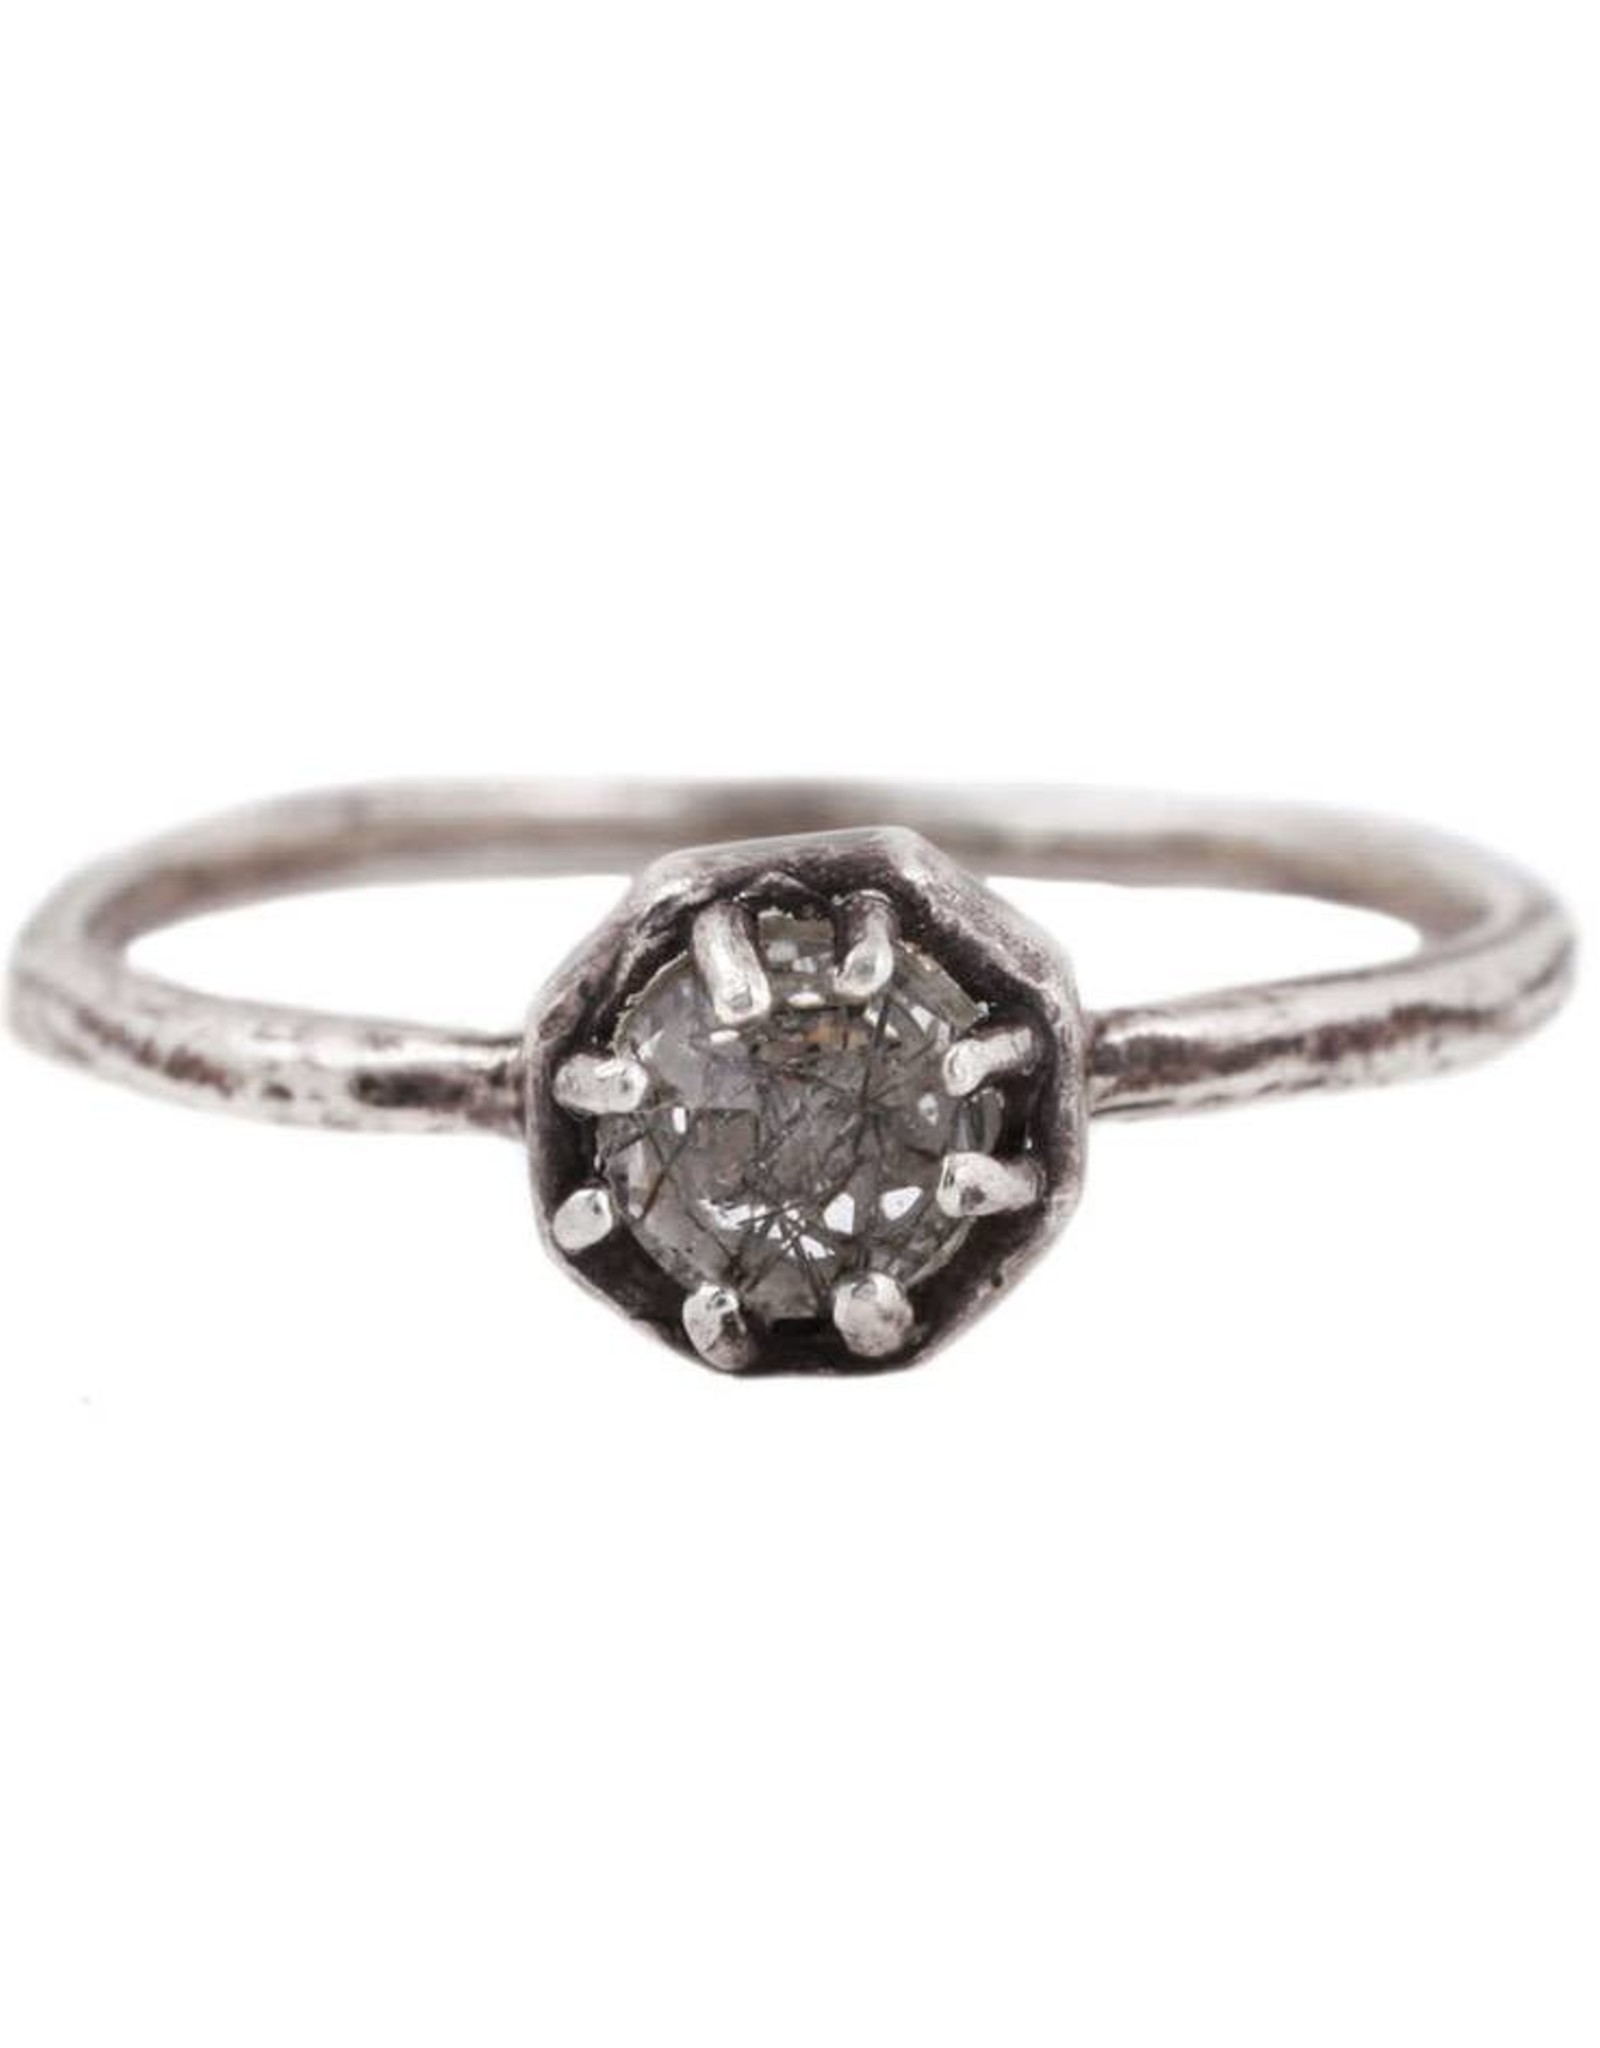 Lauren Wolf Jewelry Tiny Oxidized Silver Octagon Ring - Tourmalated Quartz